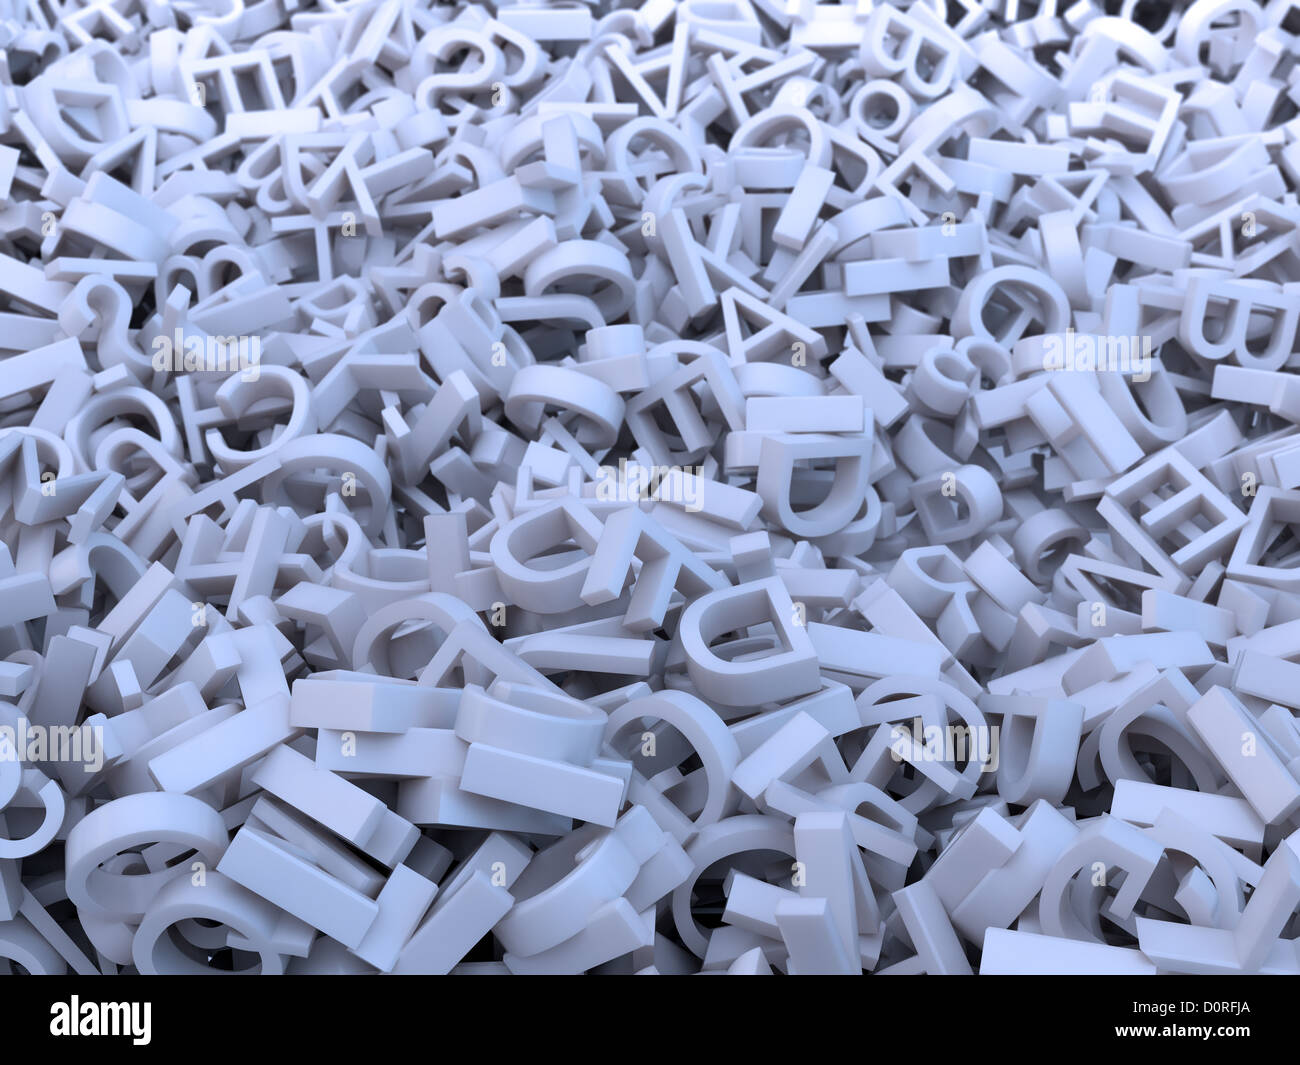 Random letters - Stock Image